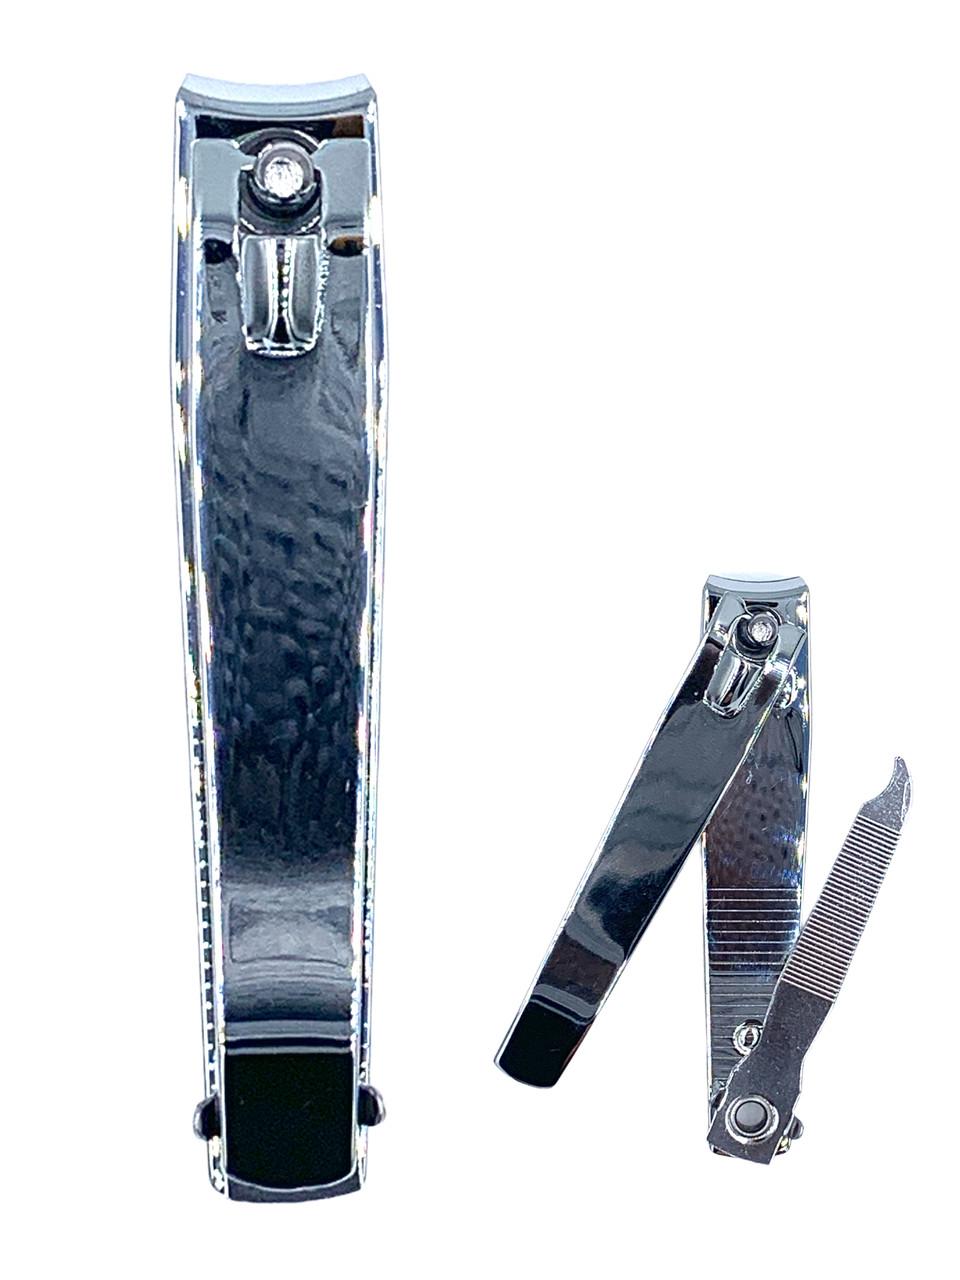 Книпсер DUP 2-8085, 85мм